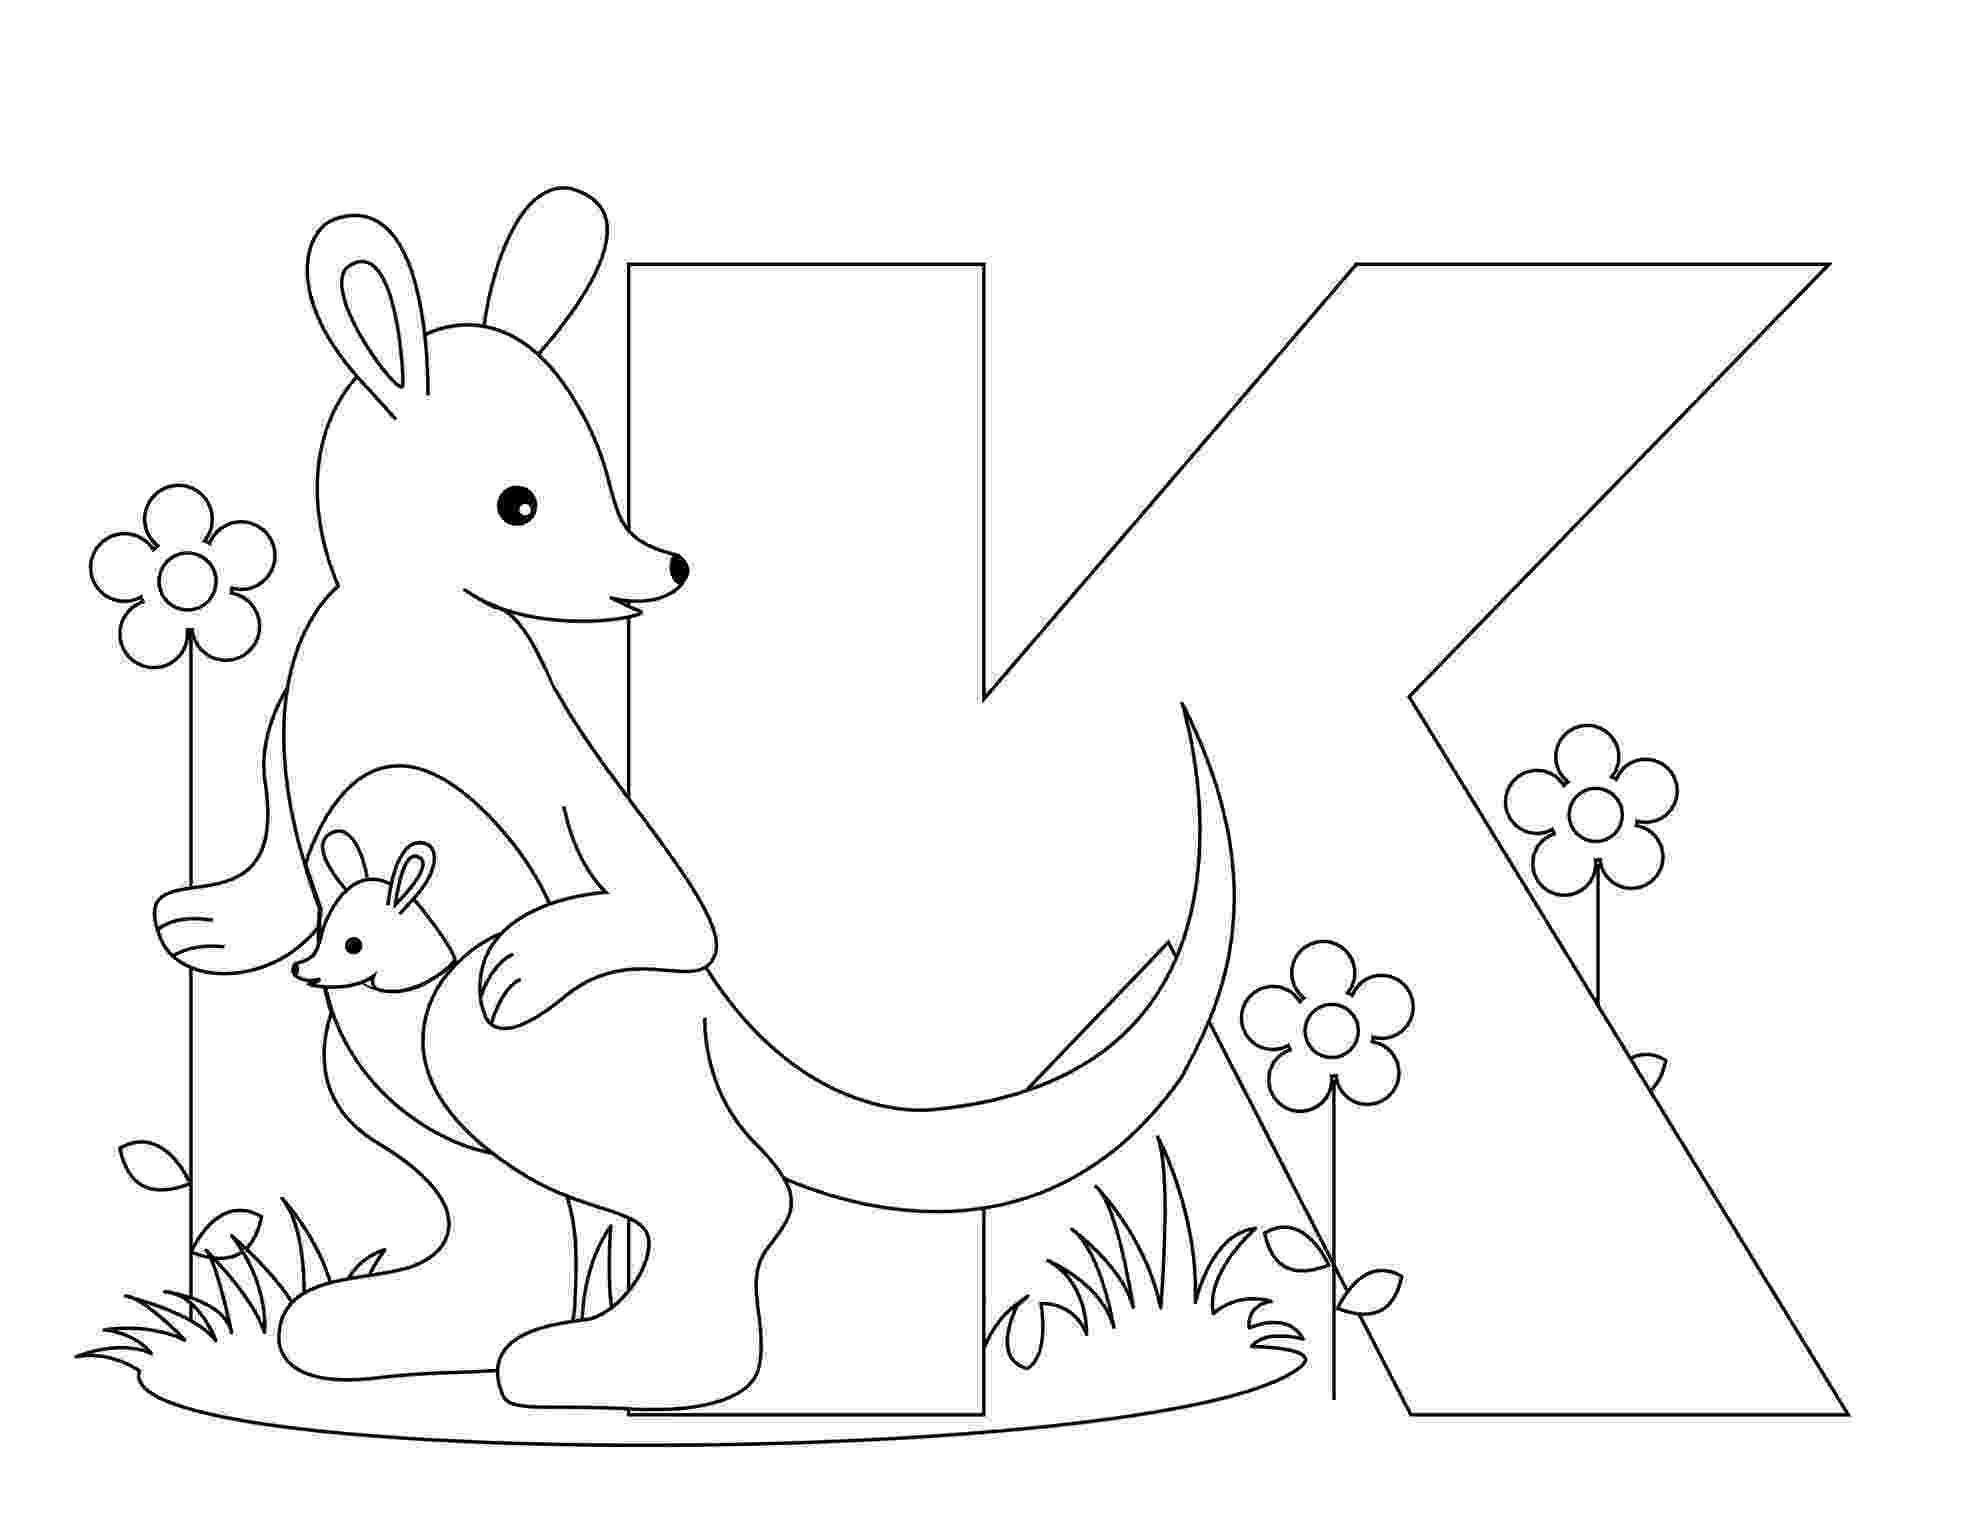 alphabet coloring worksheets free printable alphabet coloring pages for kids best coloring worksheets alphabet 1 3